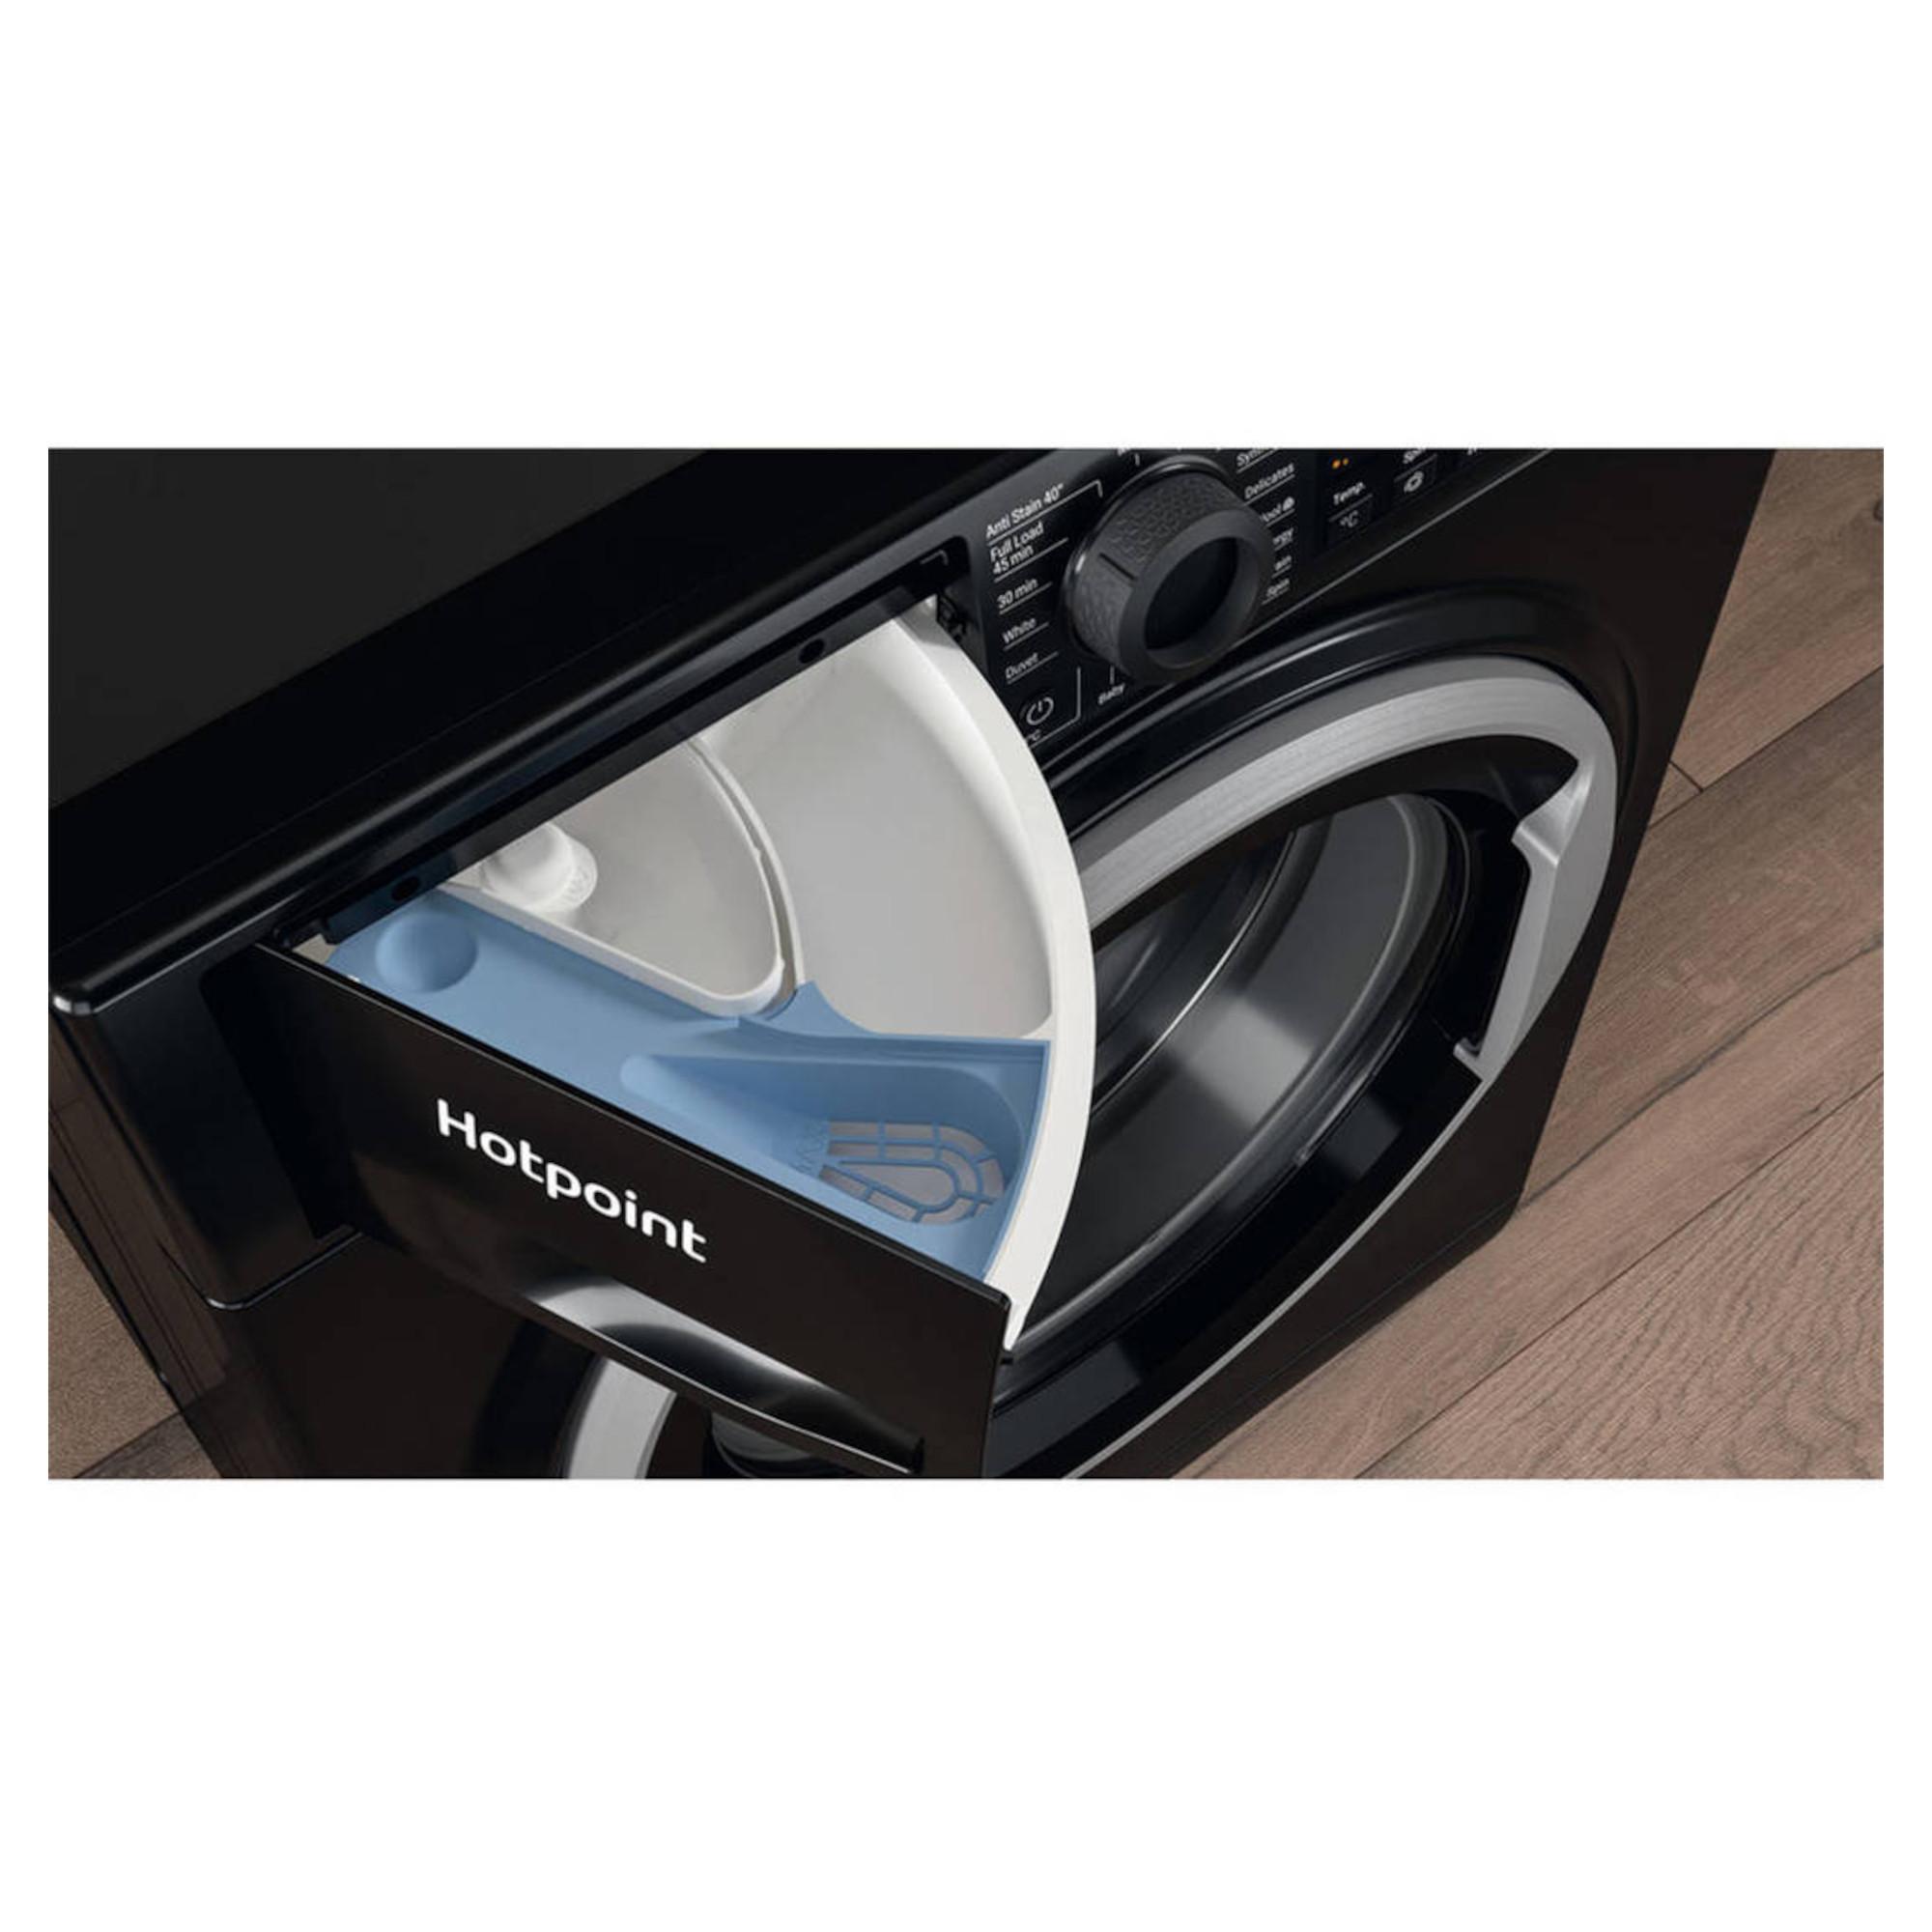 Hotpoint NSWF742UBSUKN 7kg 1400rpm Freestanding Washing Machine